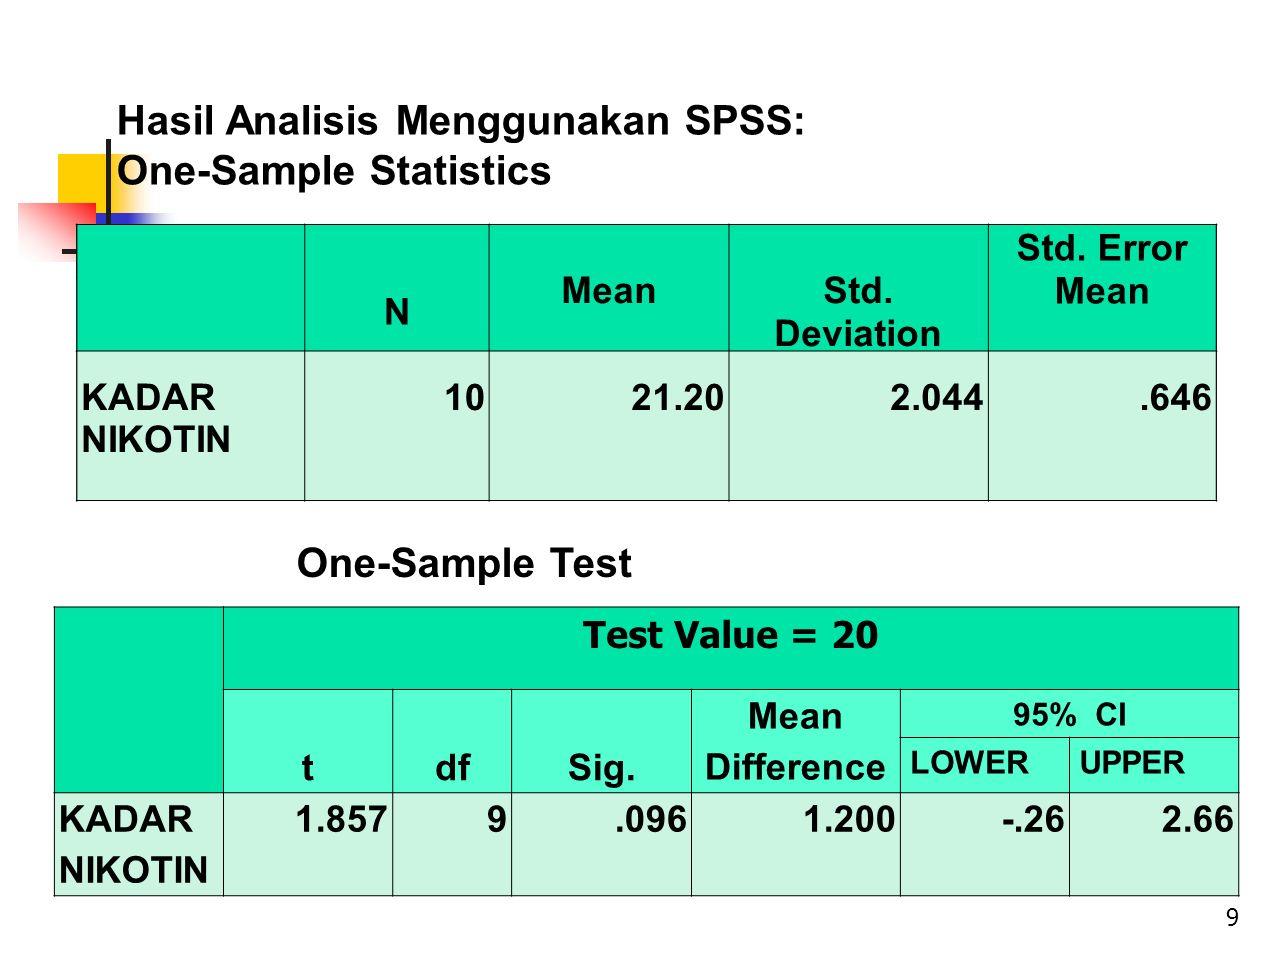 Test Value = 20 tdfSig. Mean Difference 95% CI LOWERUPPER KADAR NIKOTIN 1.8579.0961.200-.262.66 N Mean Std. Deviation Std. Error Mean KADAR NIKOTIN 10